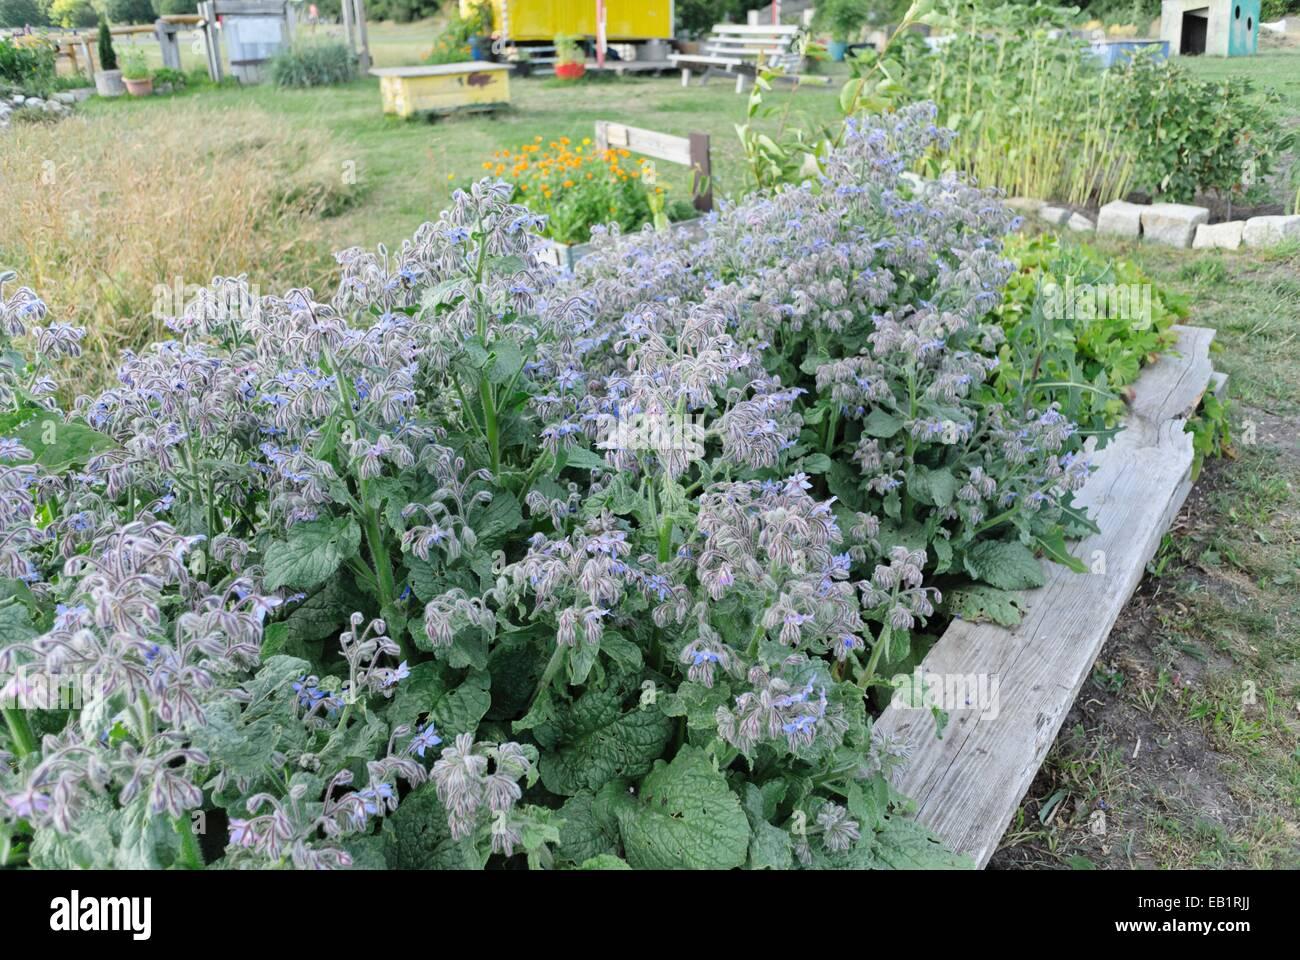 Borage (Borago officinalis) in a community garden, Tempelhofer Freiheit, Berlin, Germany - Stock Image